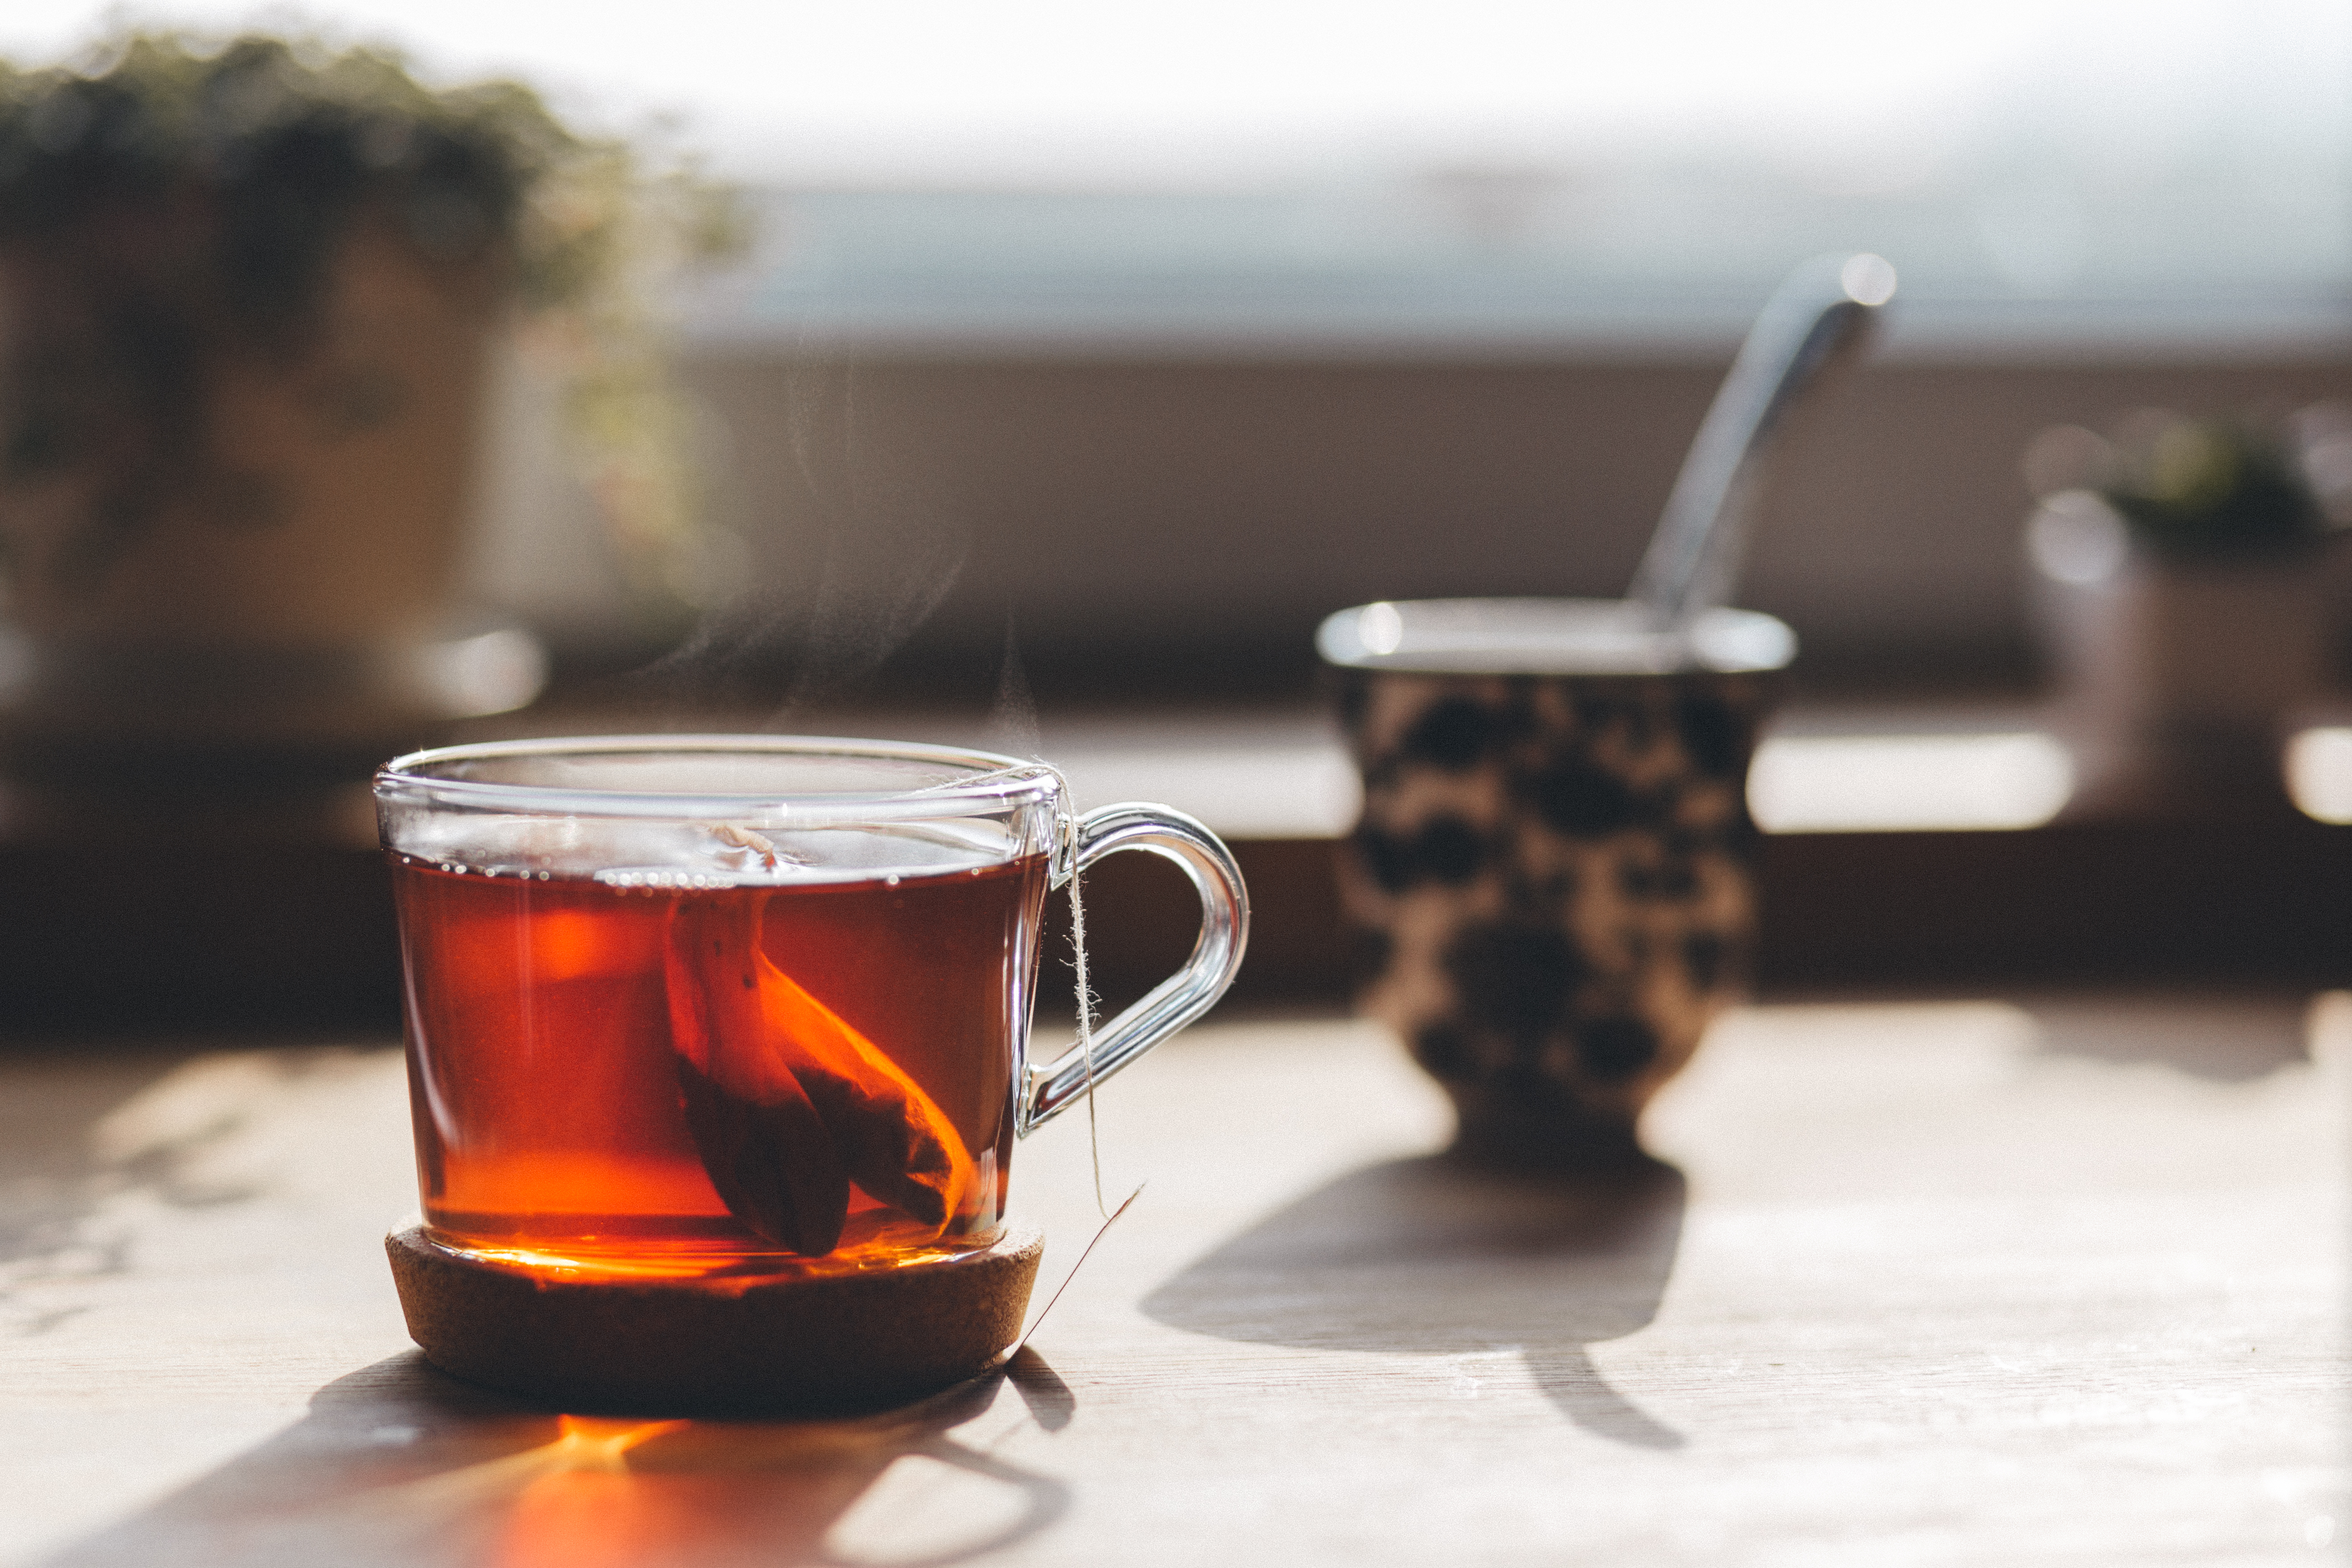 Drinking Tea Makes You More Creative photo